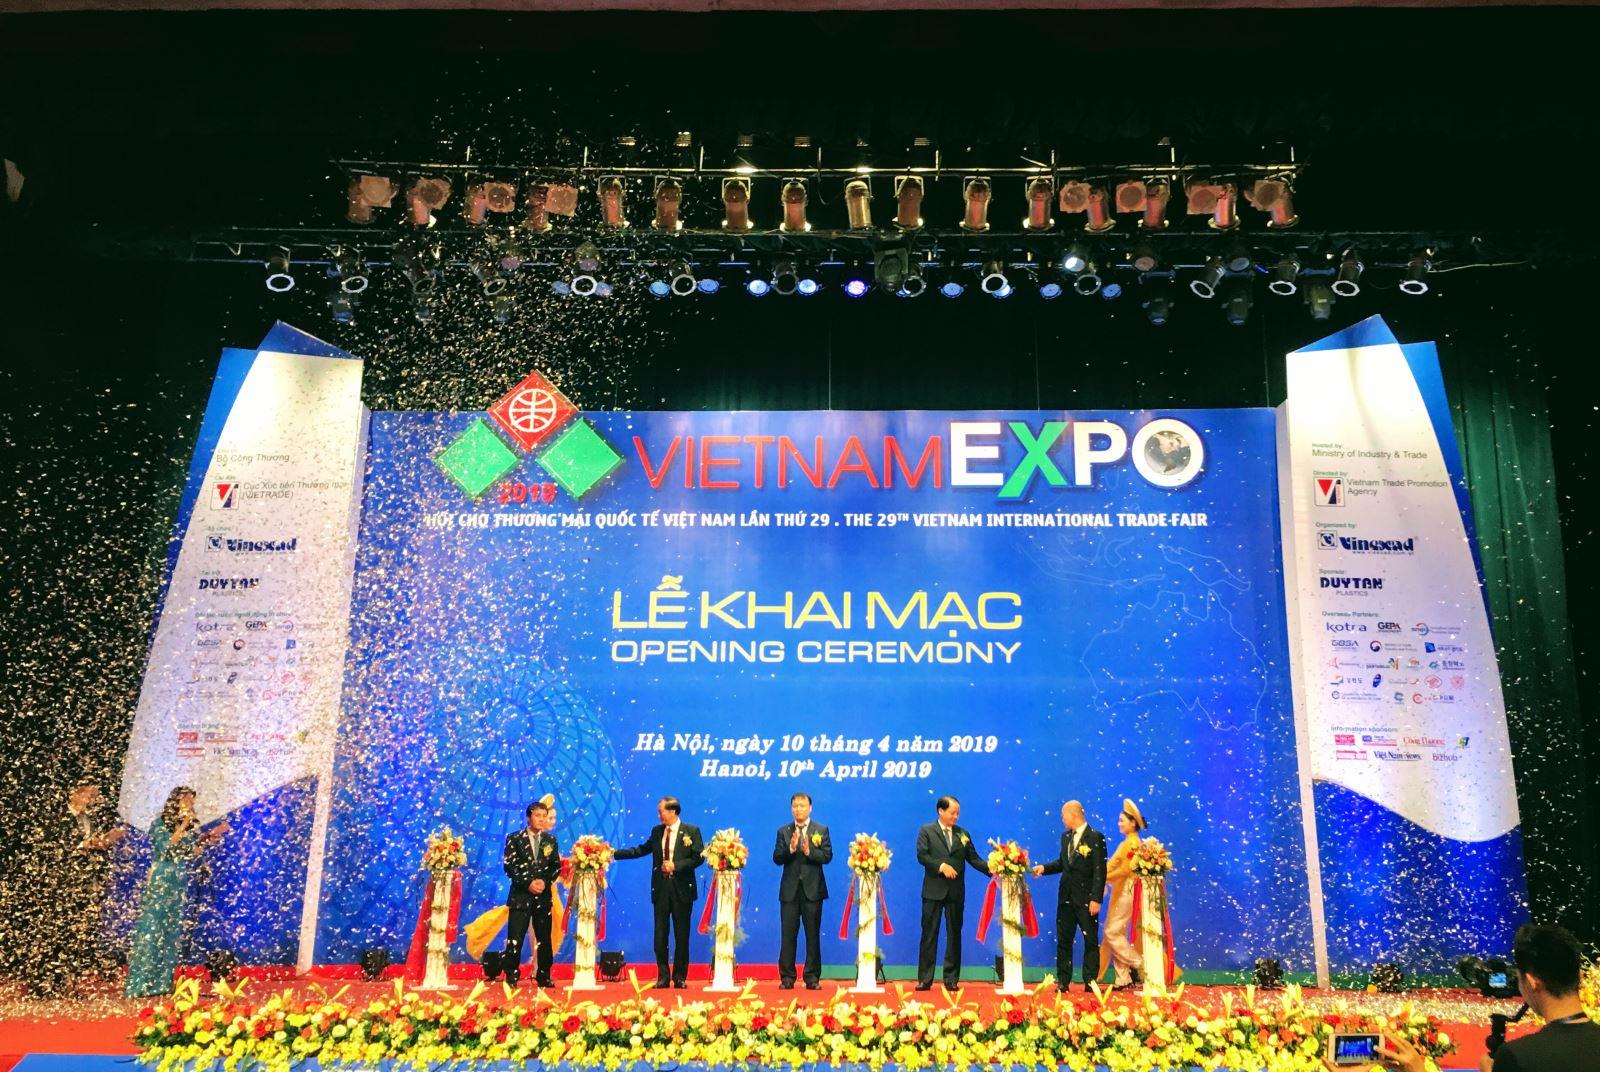 500 exhibitors join Vietnam Expo 2019